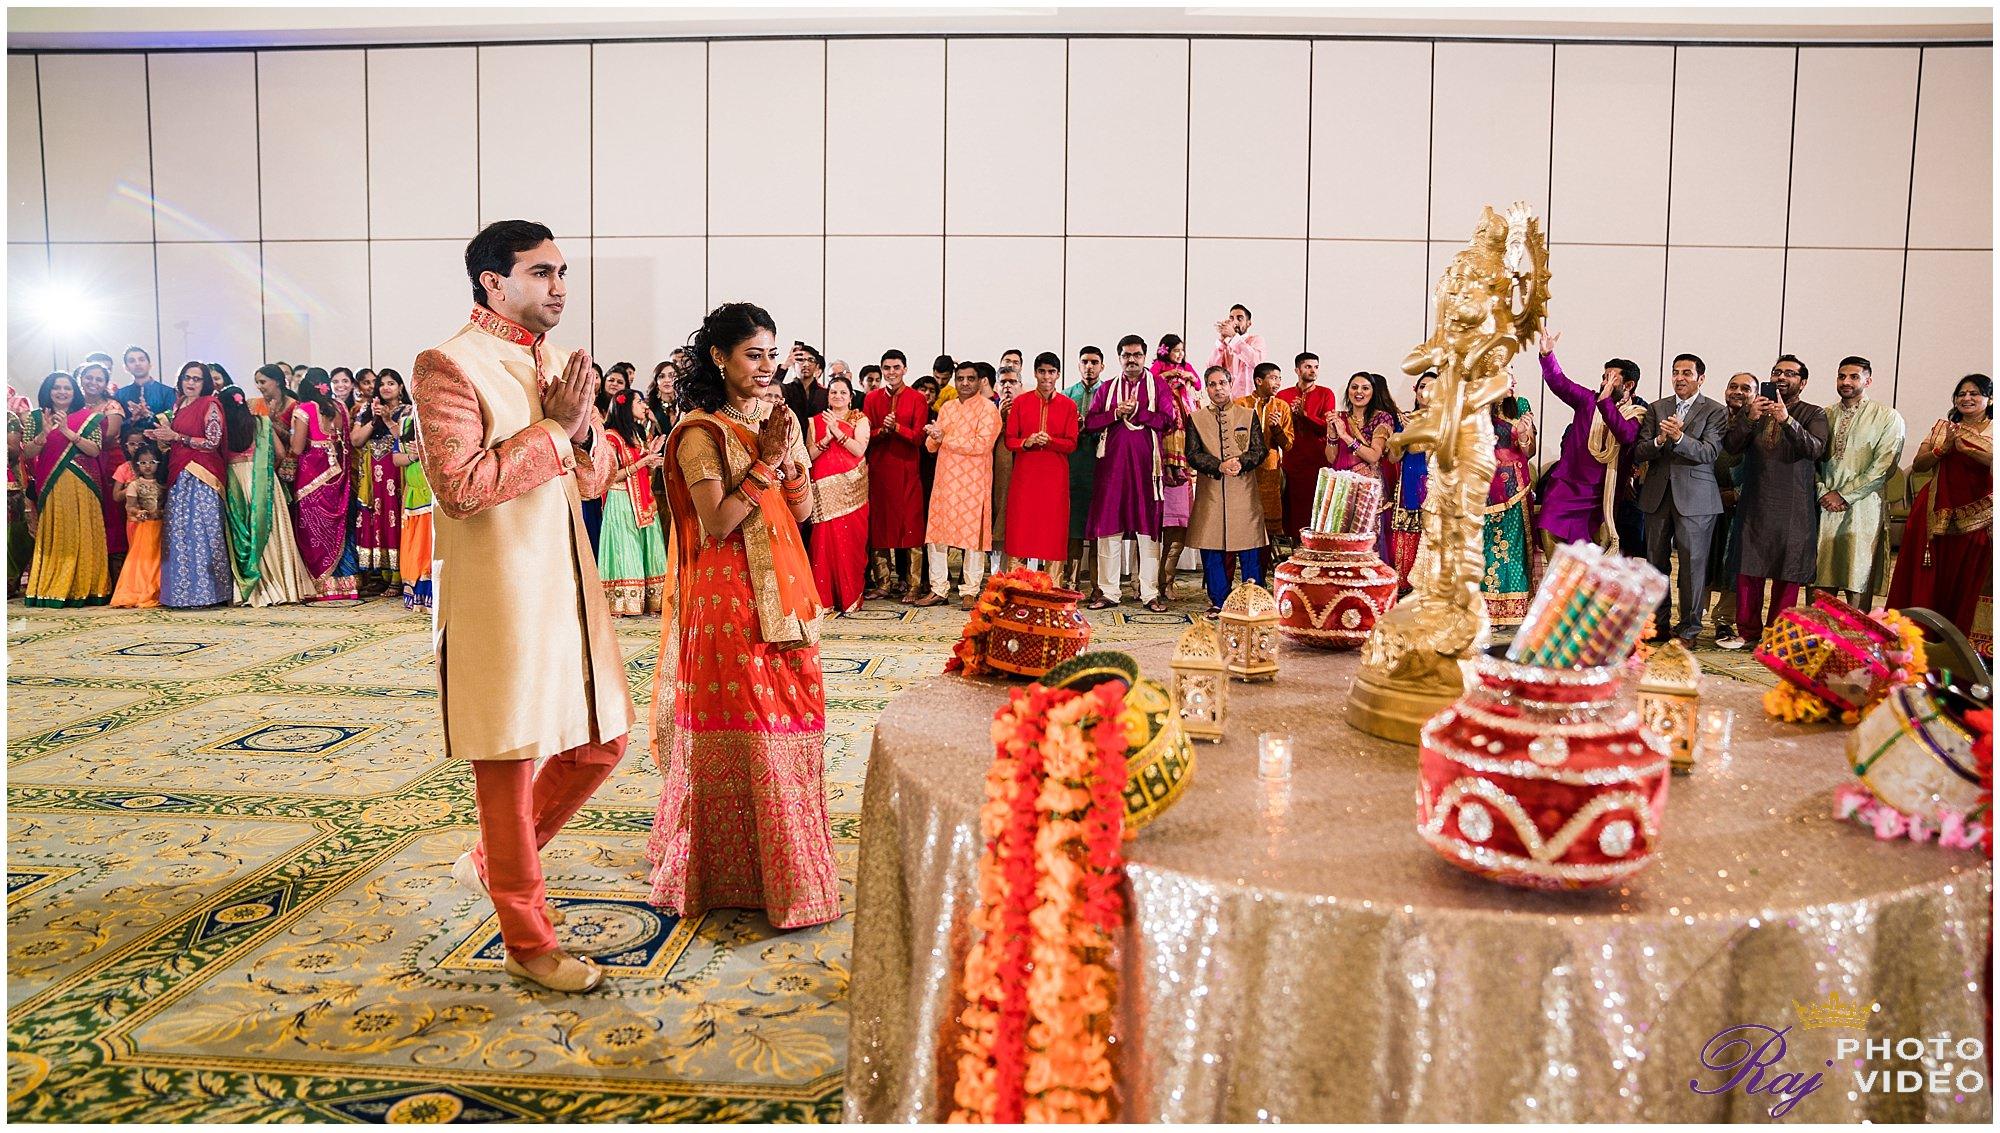 Founders-Inn-and-Spa-Virginia-Beach-VA-Indian-Wedding-Harini-Vivek-2.jpg